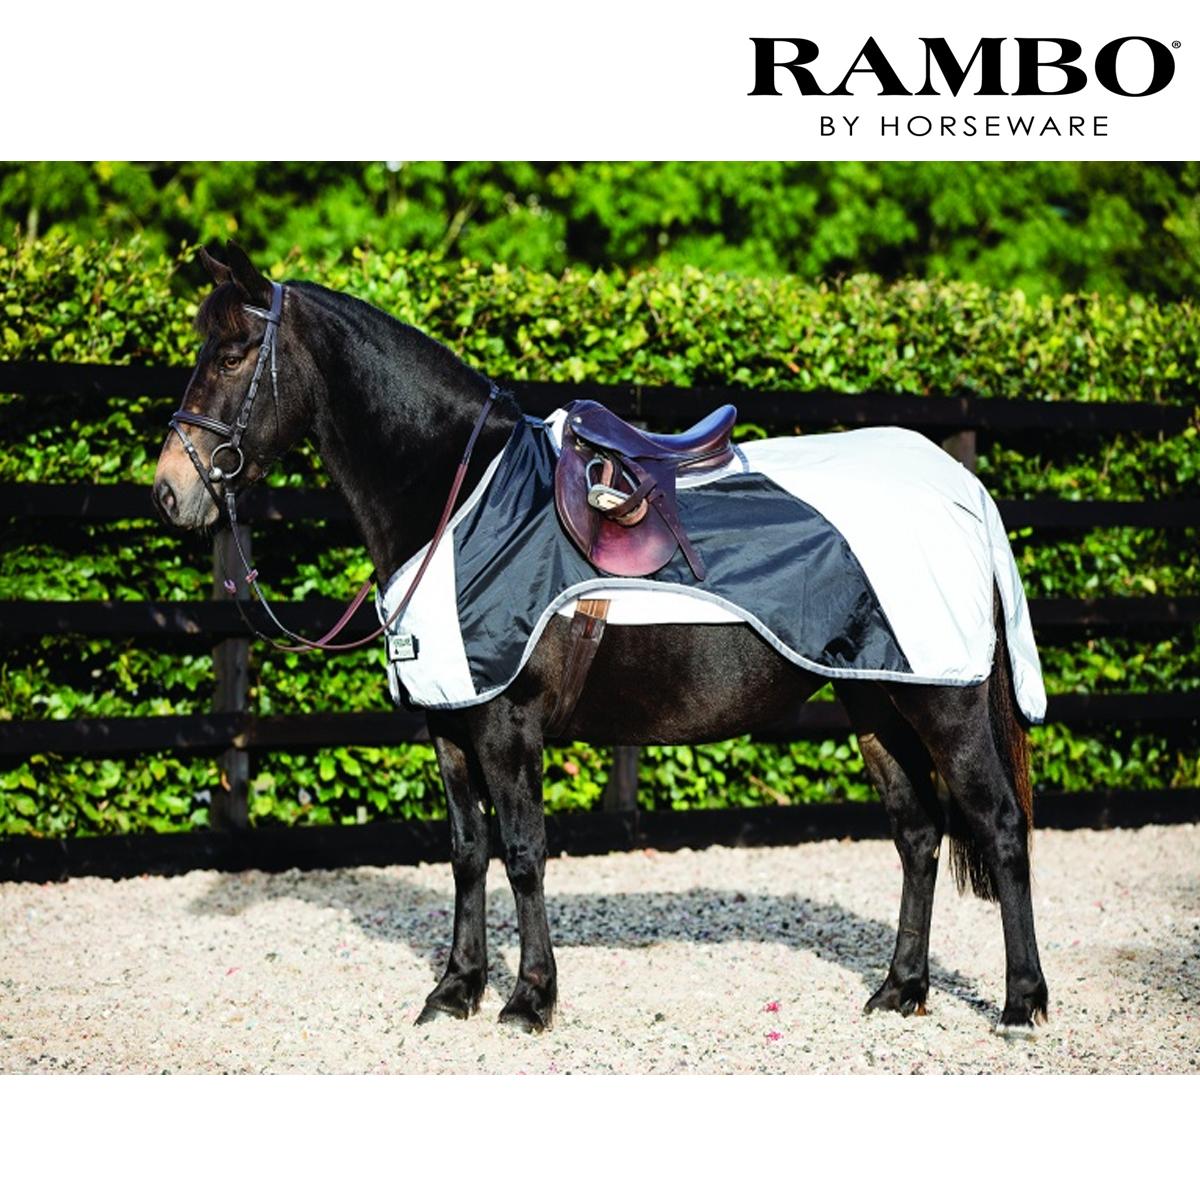 Horseware Rambo Pony Night rider rider Night Exercise Rug 4d7231